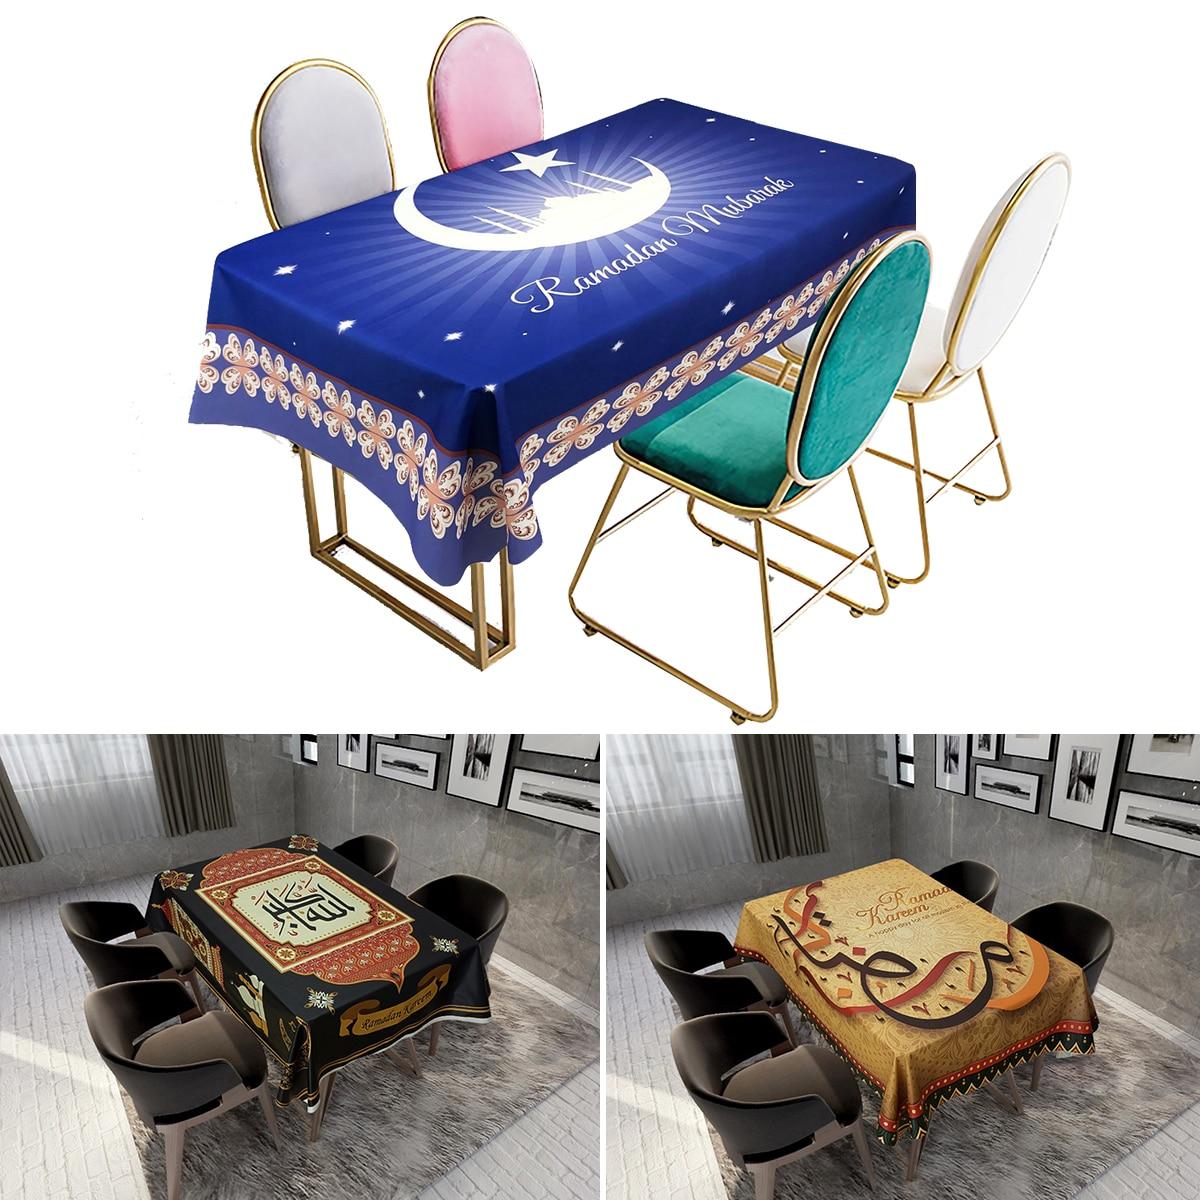 Eid Mubarak Tablecloth Islamic Muslim Party Decor Ramadan And Eid Decor Kareem Ramadan Decor For Home Happy Eid Al Adha Gifts